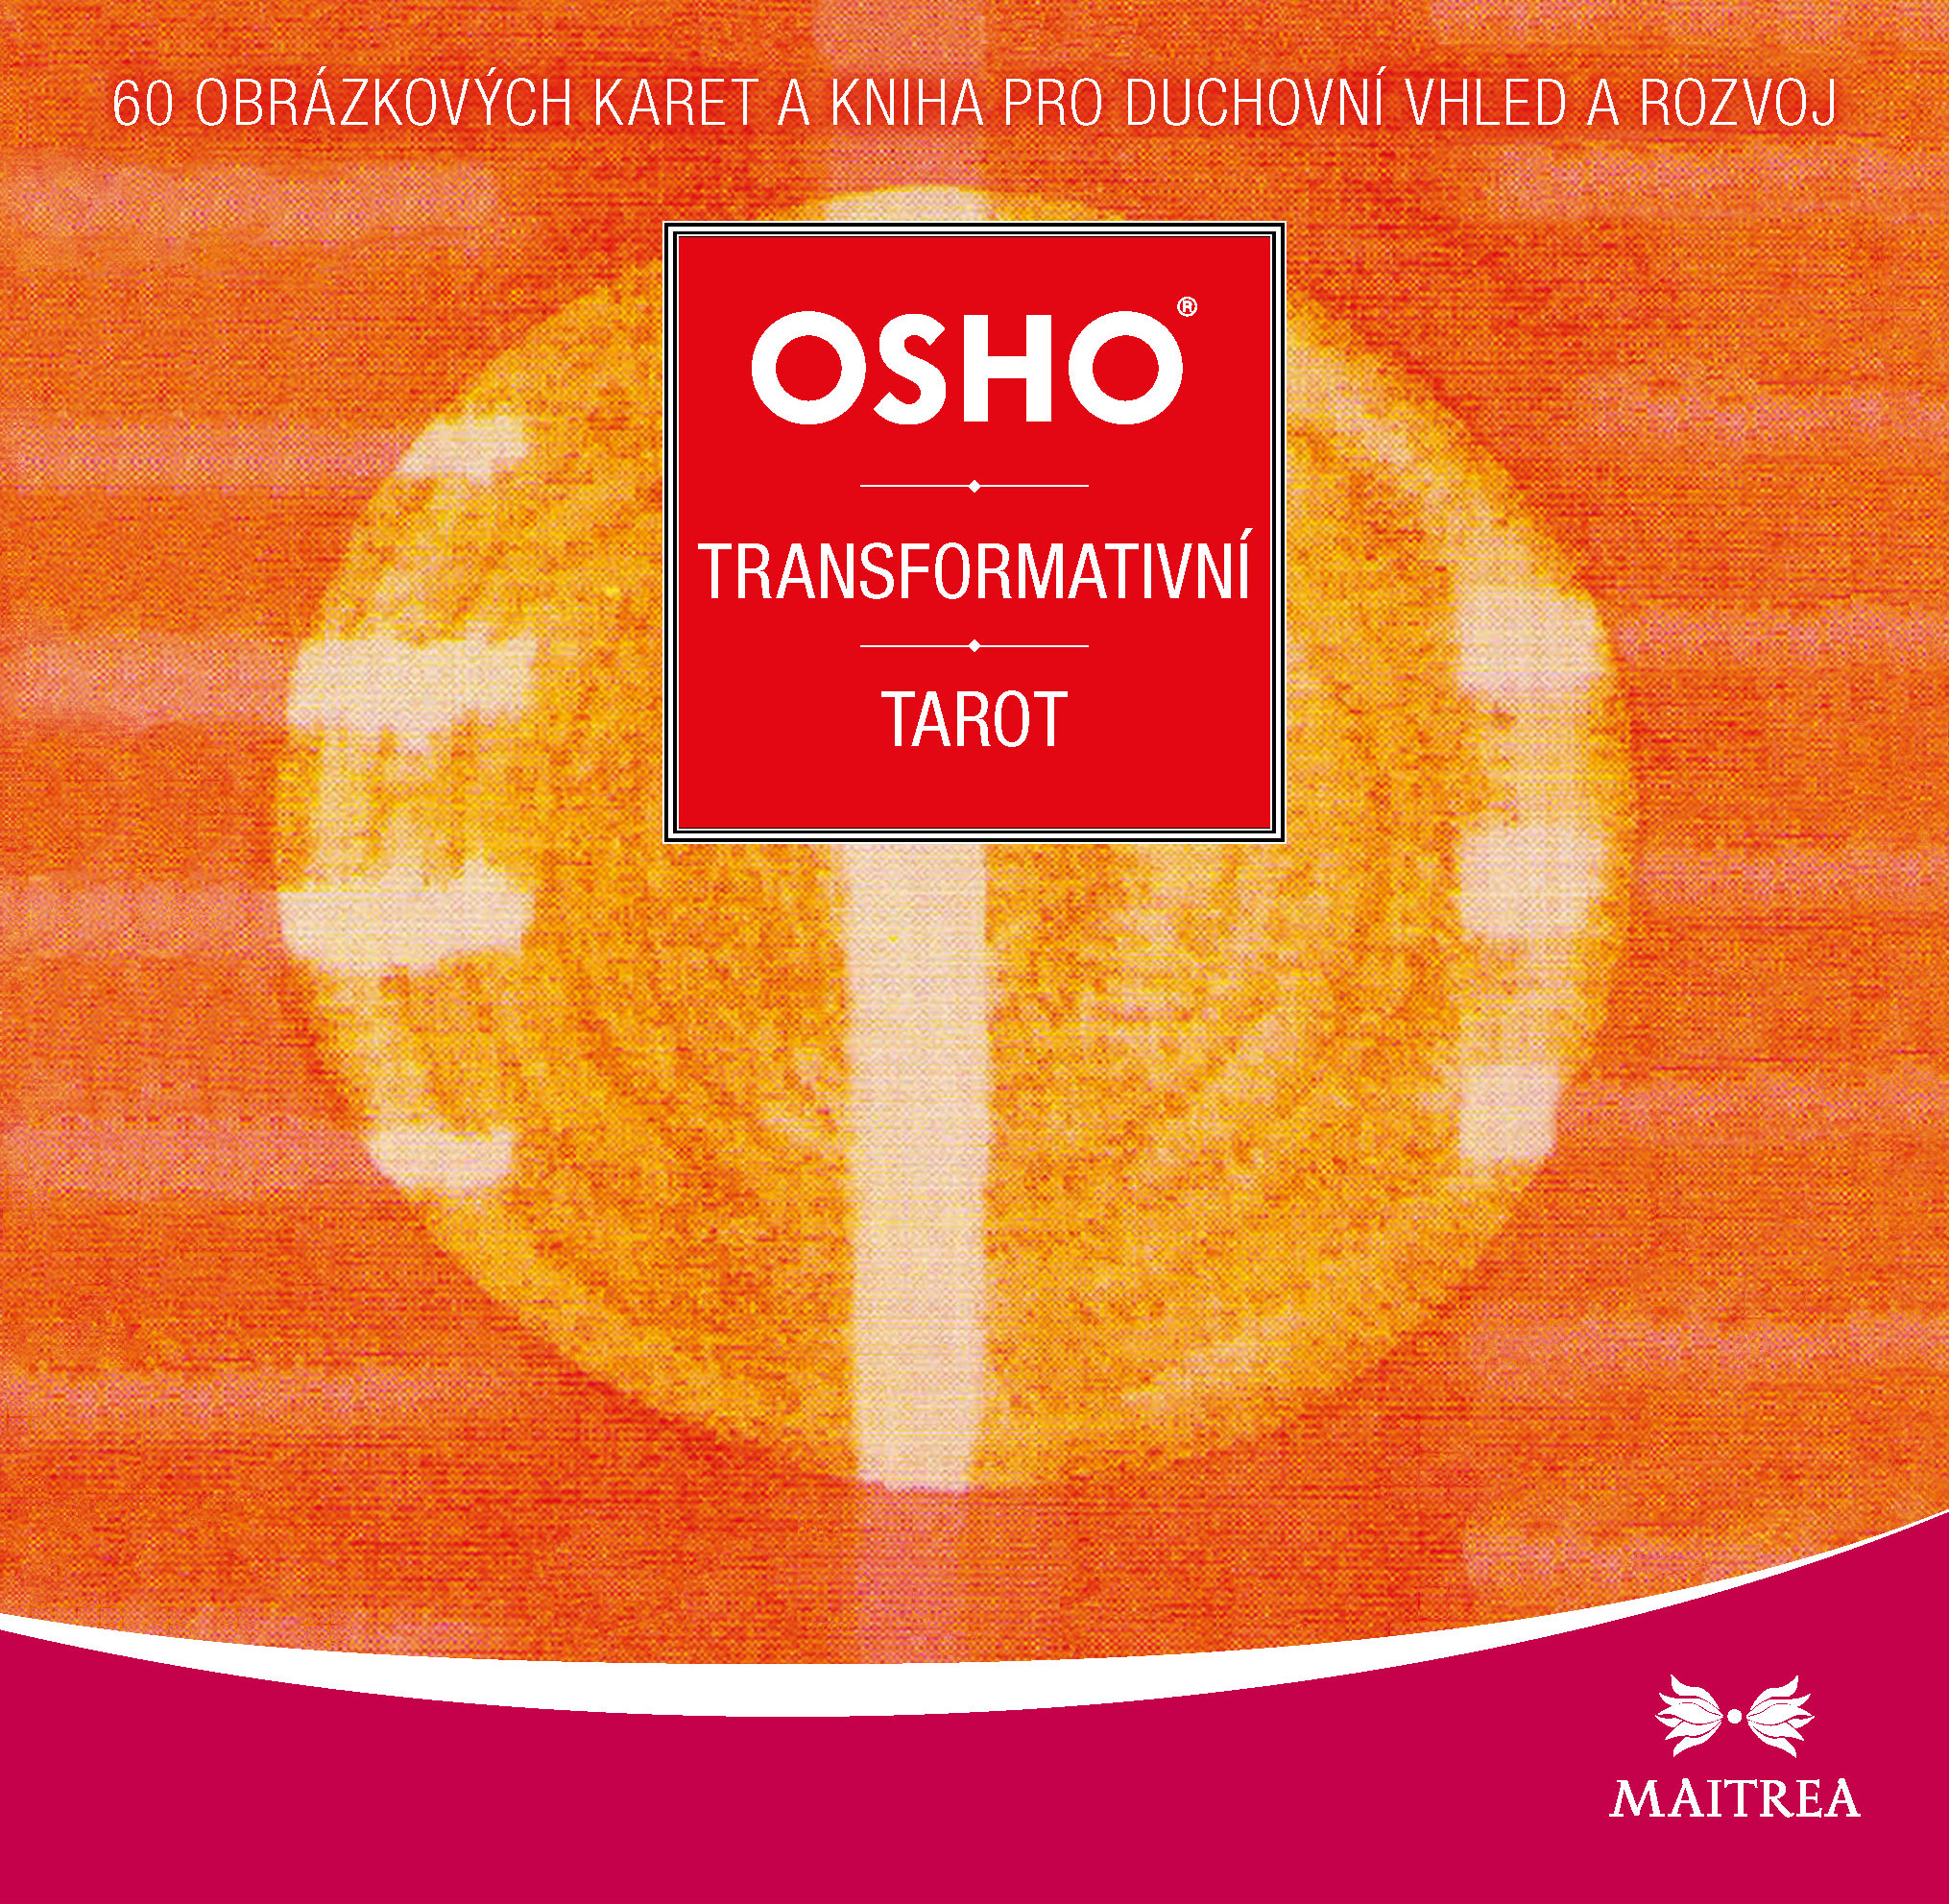 Transformativní tarot